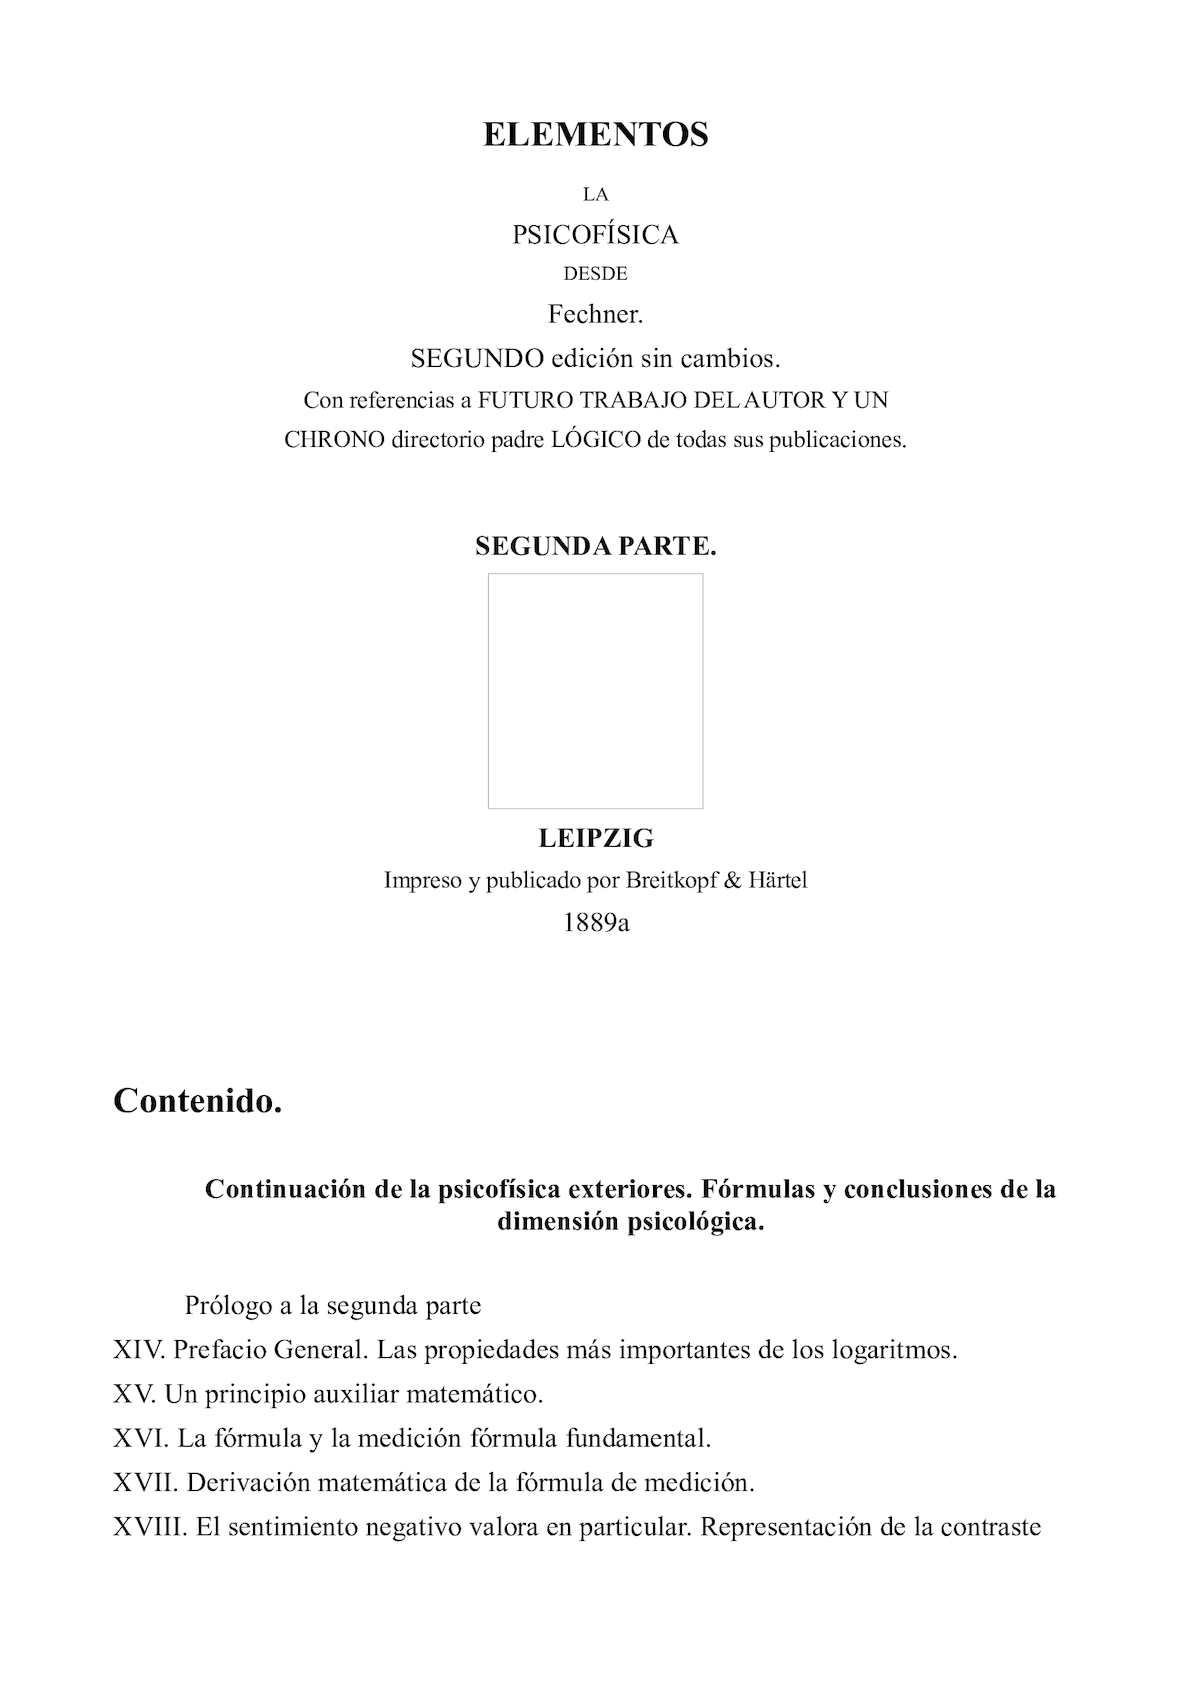 Calaméo - Elementos La Psicofísica 02 Castellano Gustav Theodor Fechner